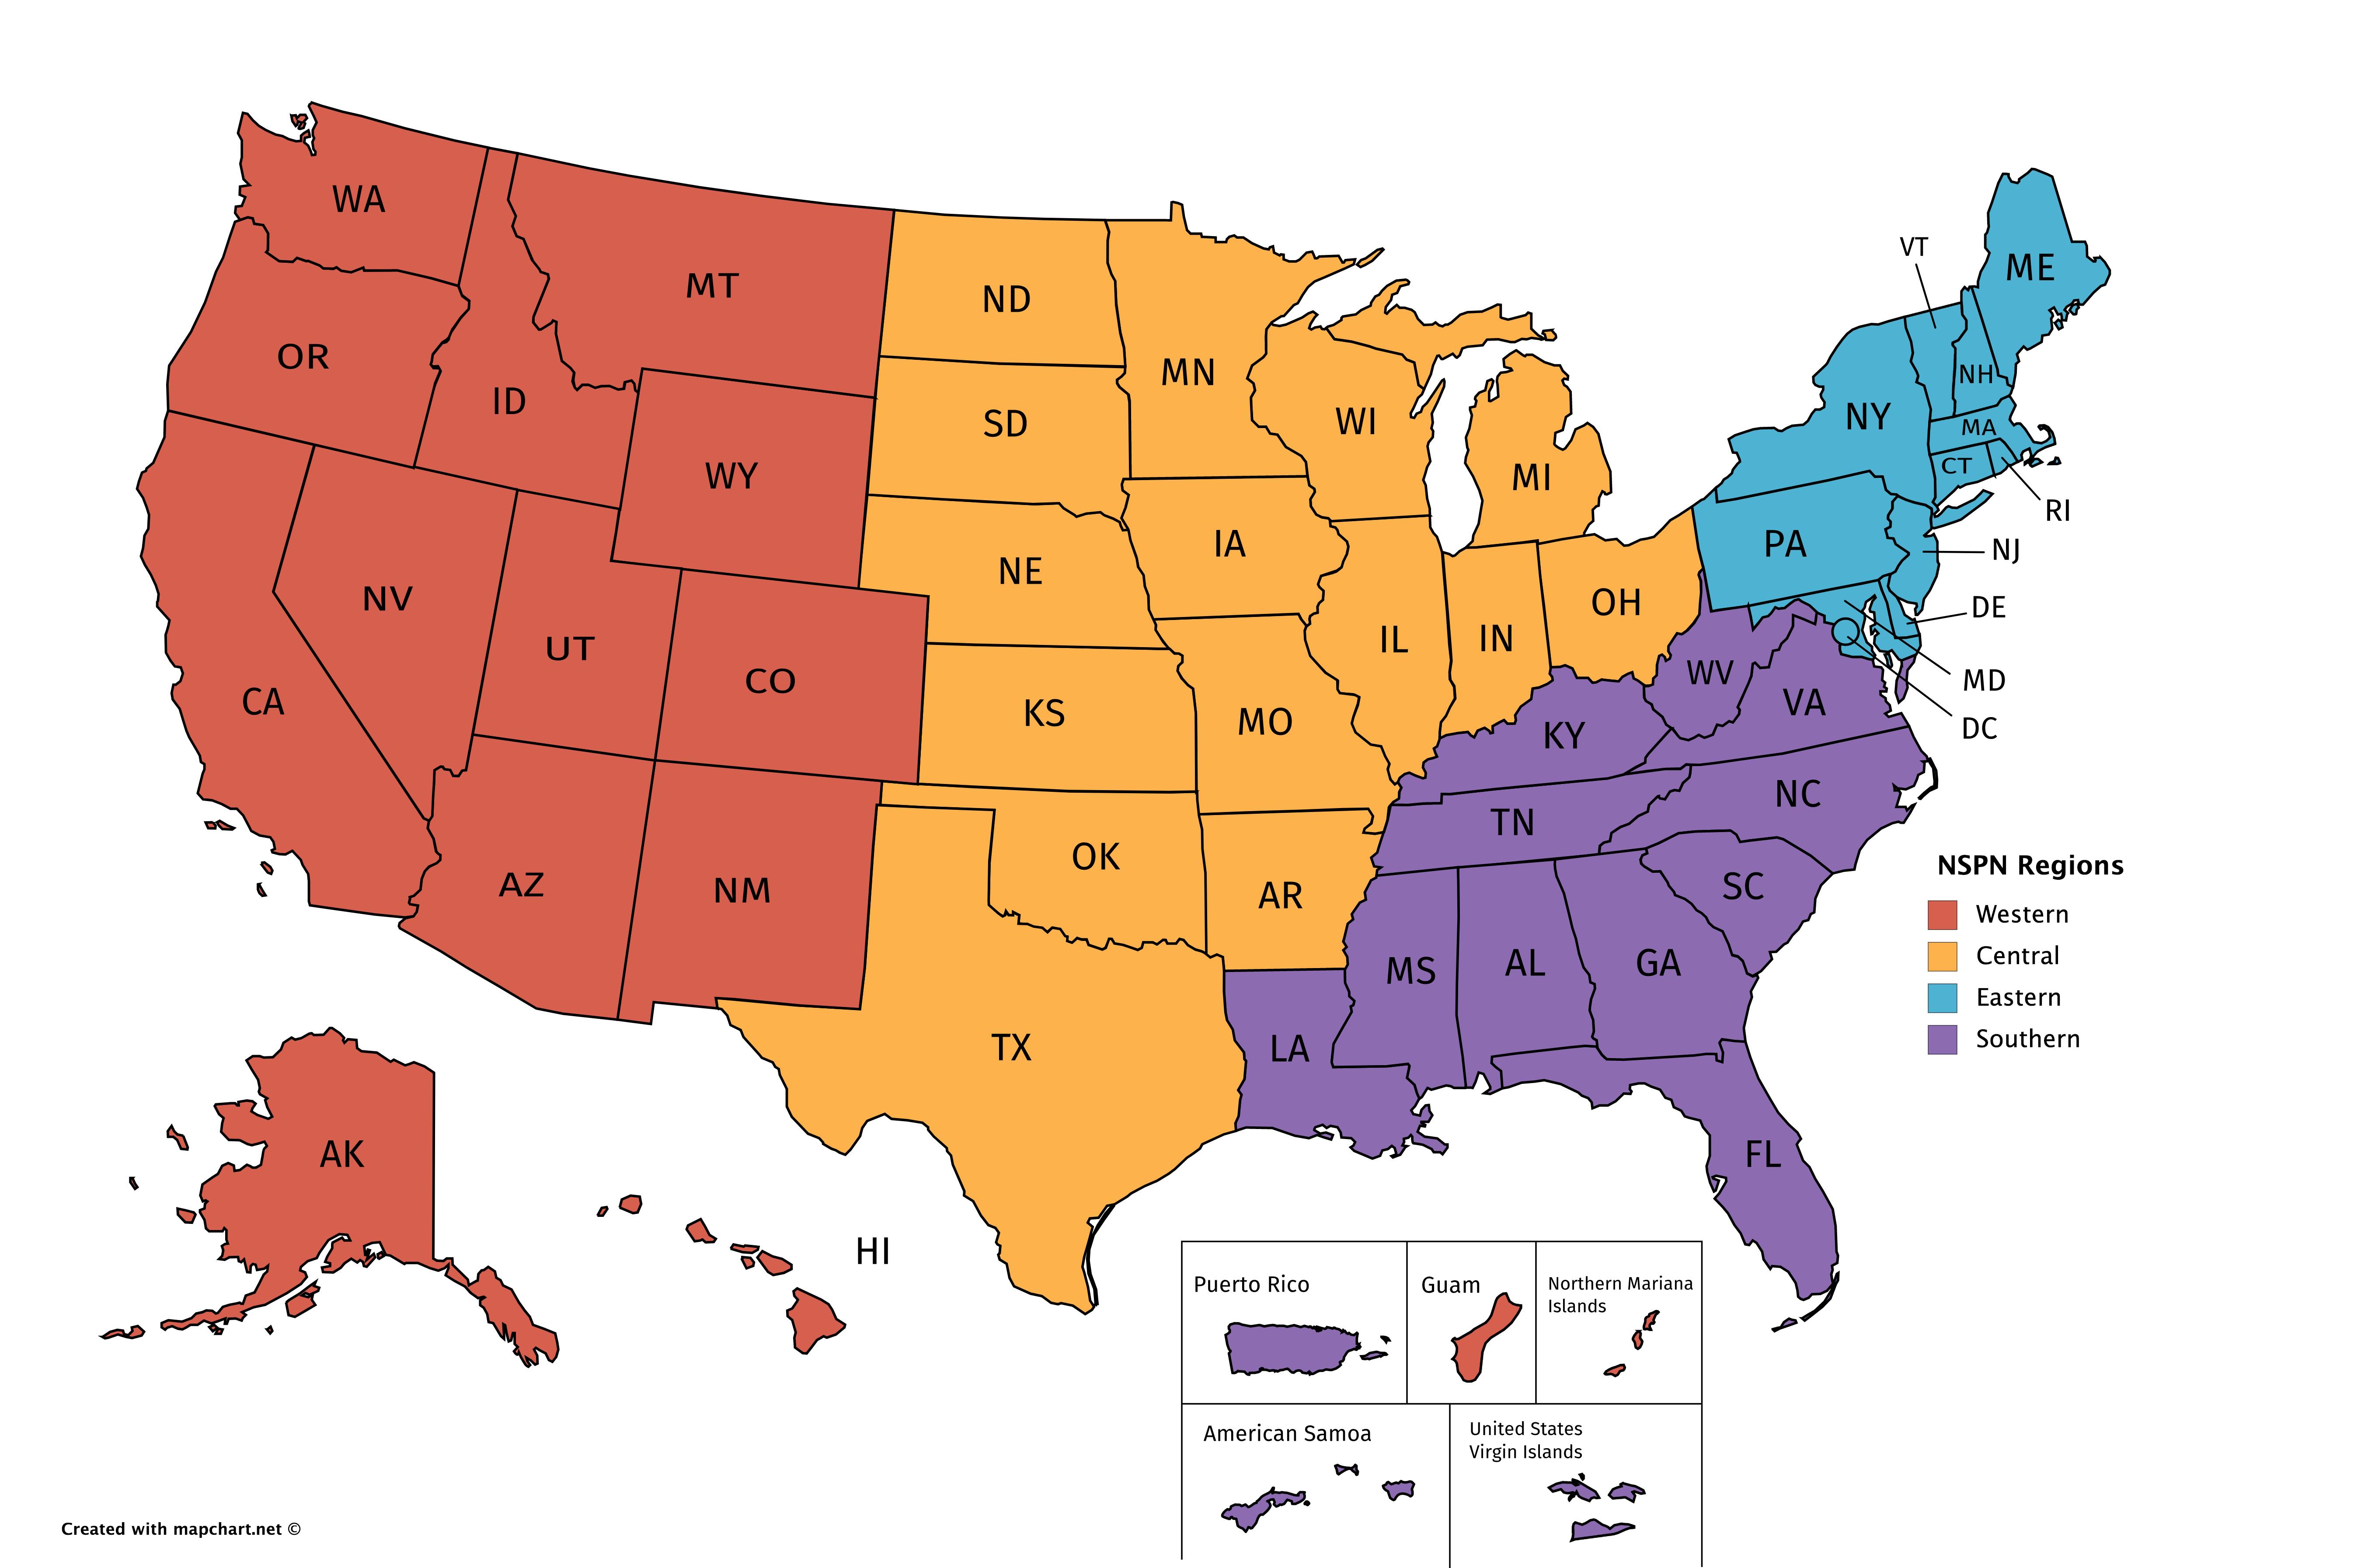 NSPN Regions Map